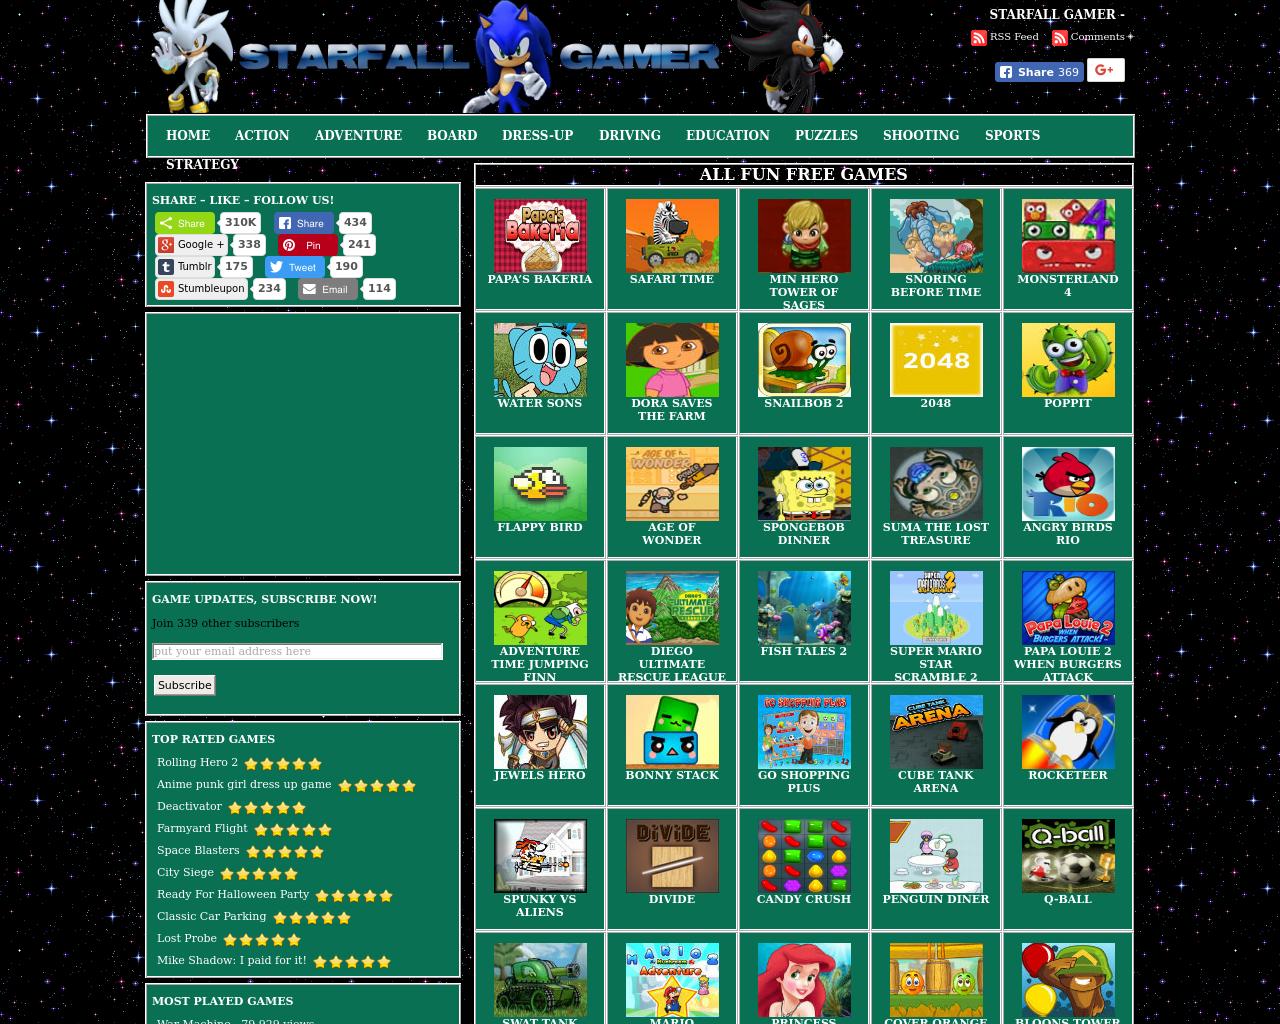 Starfall-Gamer-Advertising-Reviews-Pricing